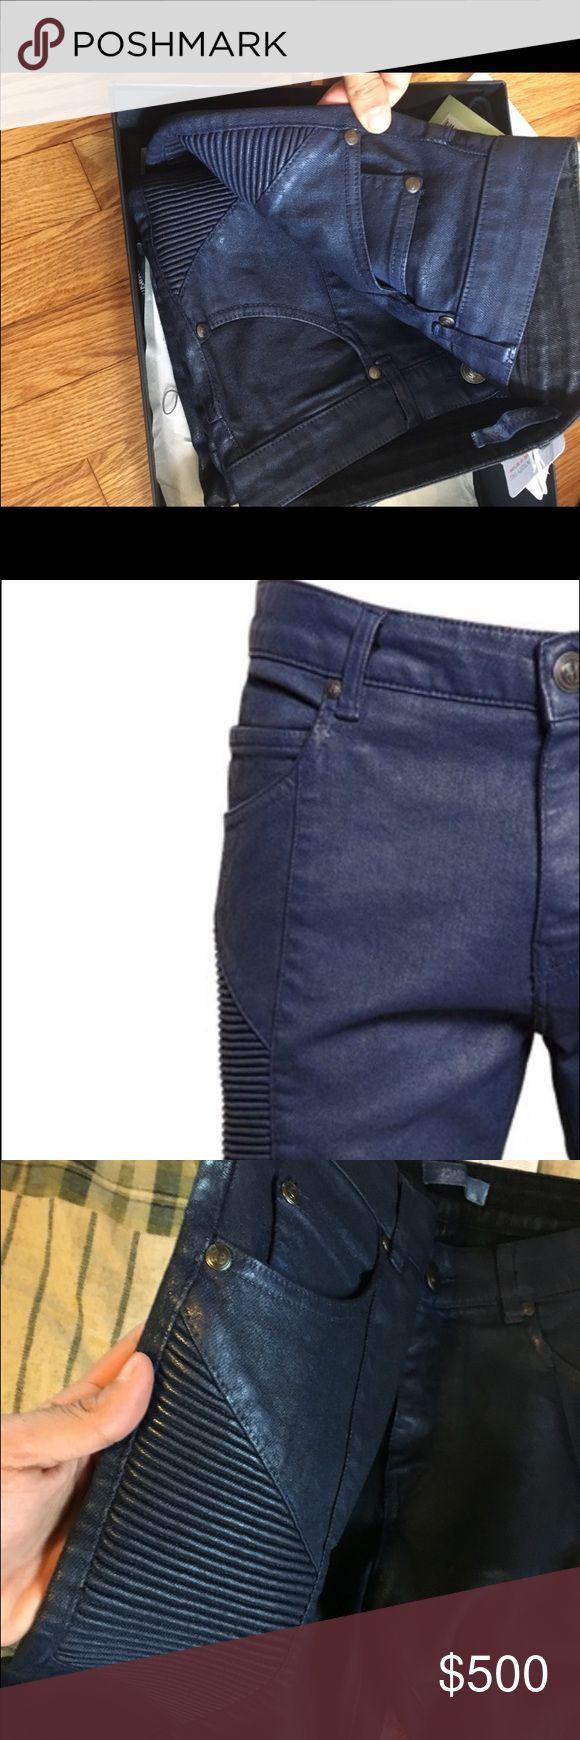 Pierre Balmain Brand new Pierre balmains. Come with tags. Size 31. Waxed denim. Pierre Balmain Jeans Skinny